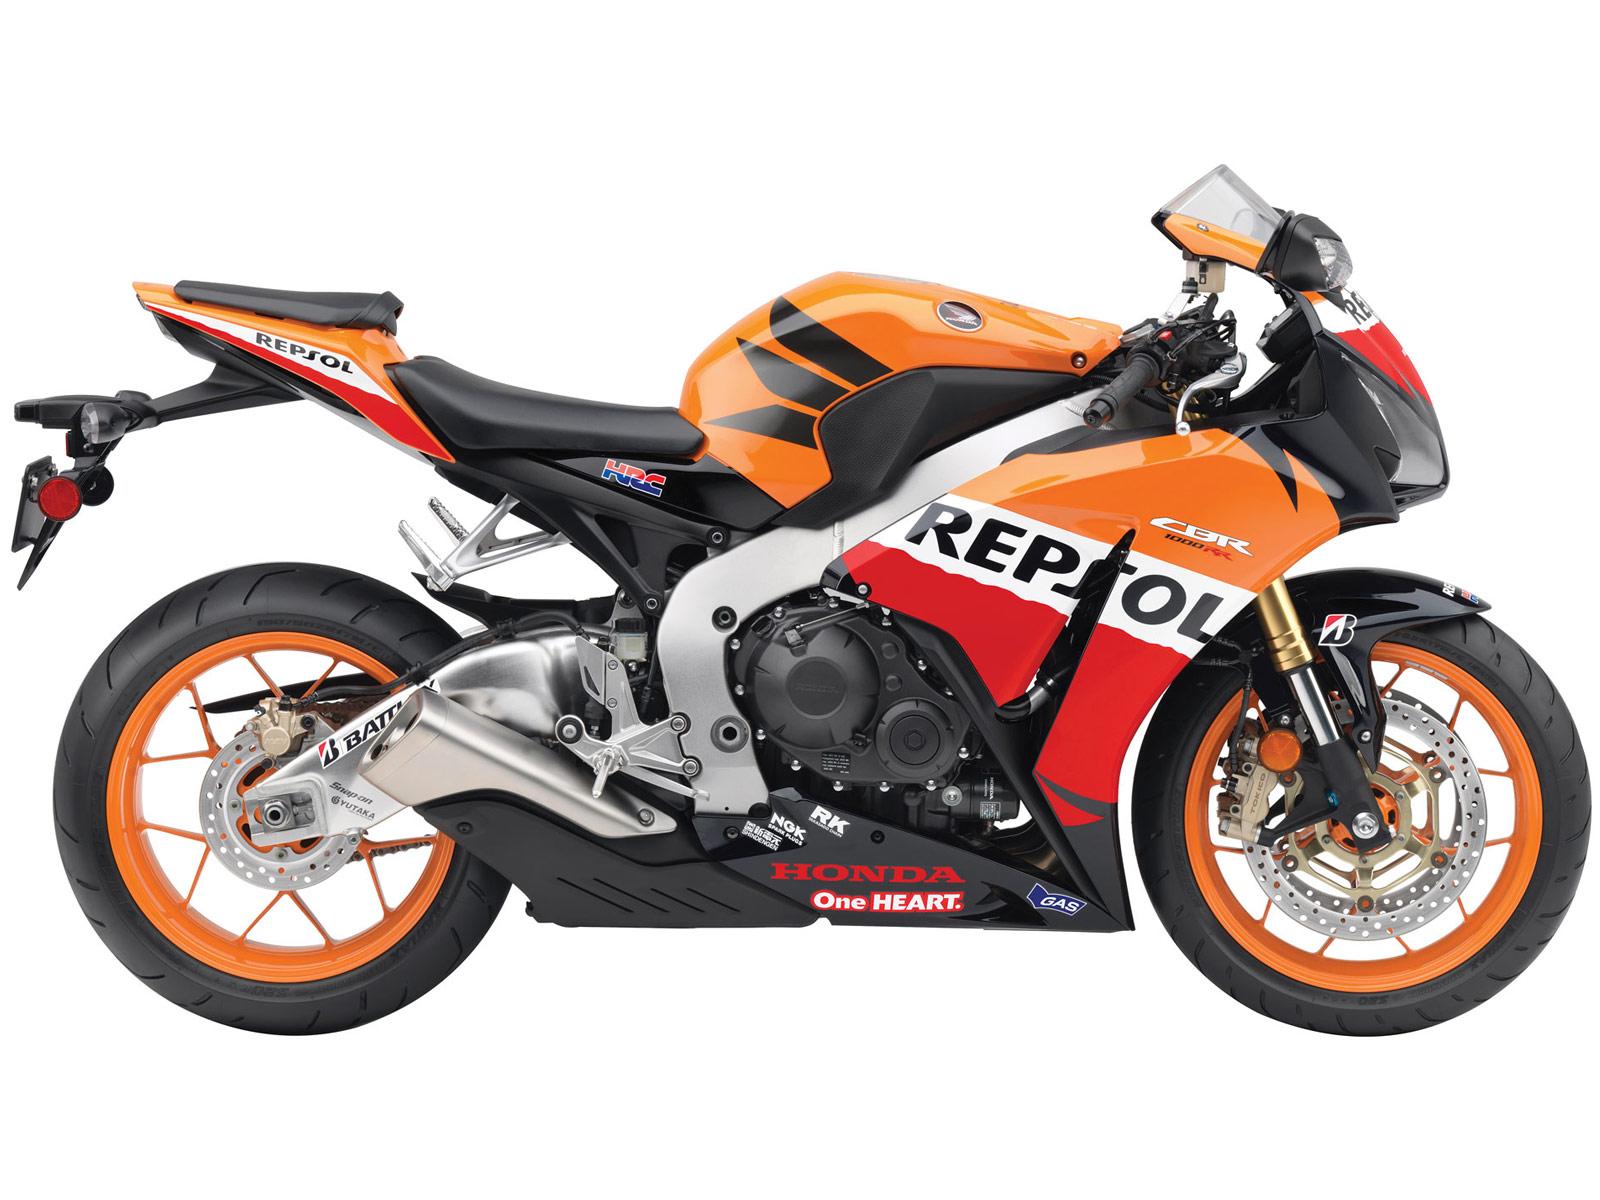 Dload hd pics honda bikes honda 500cc bikes wallpapers for Yamaha 500cc sport bikes